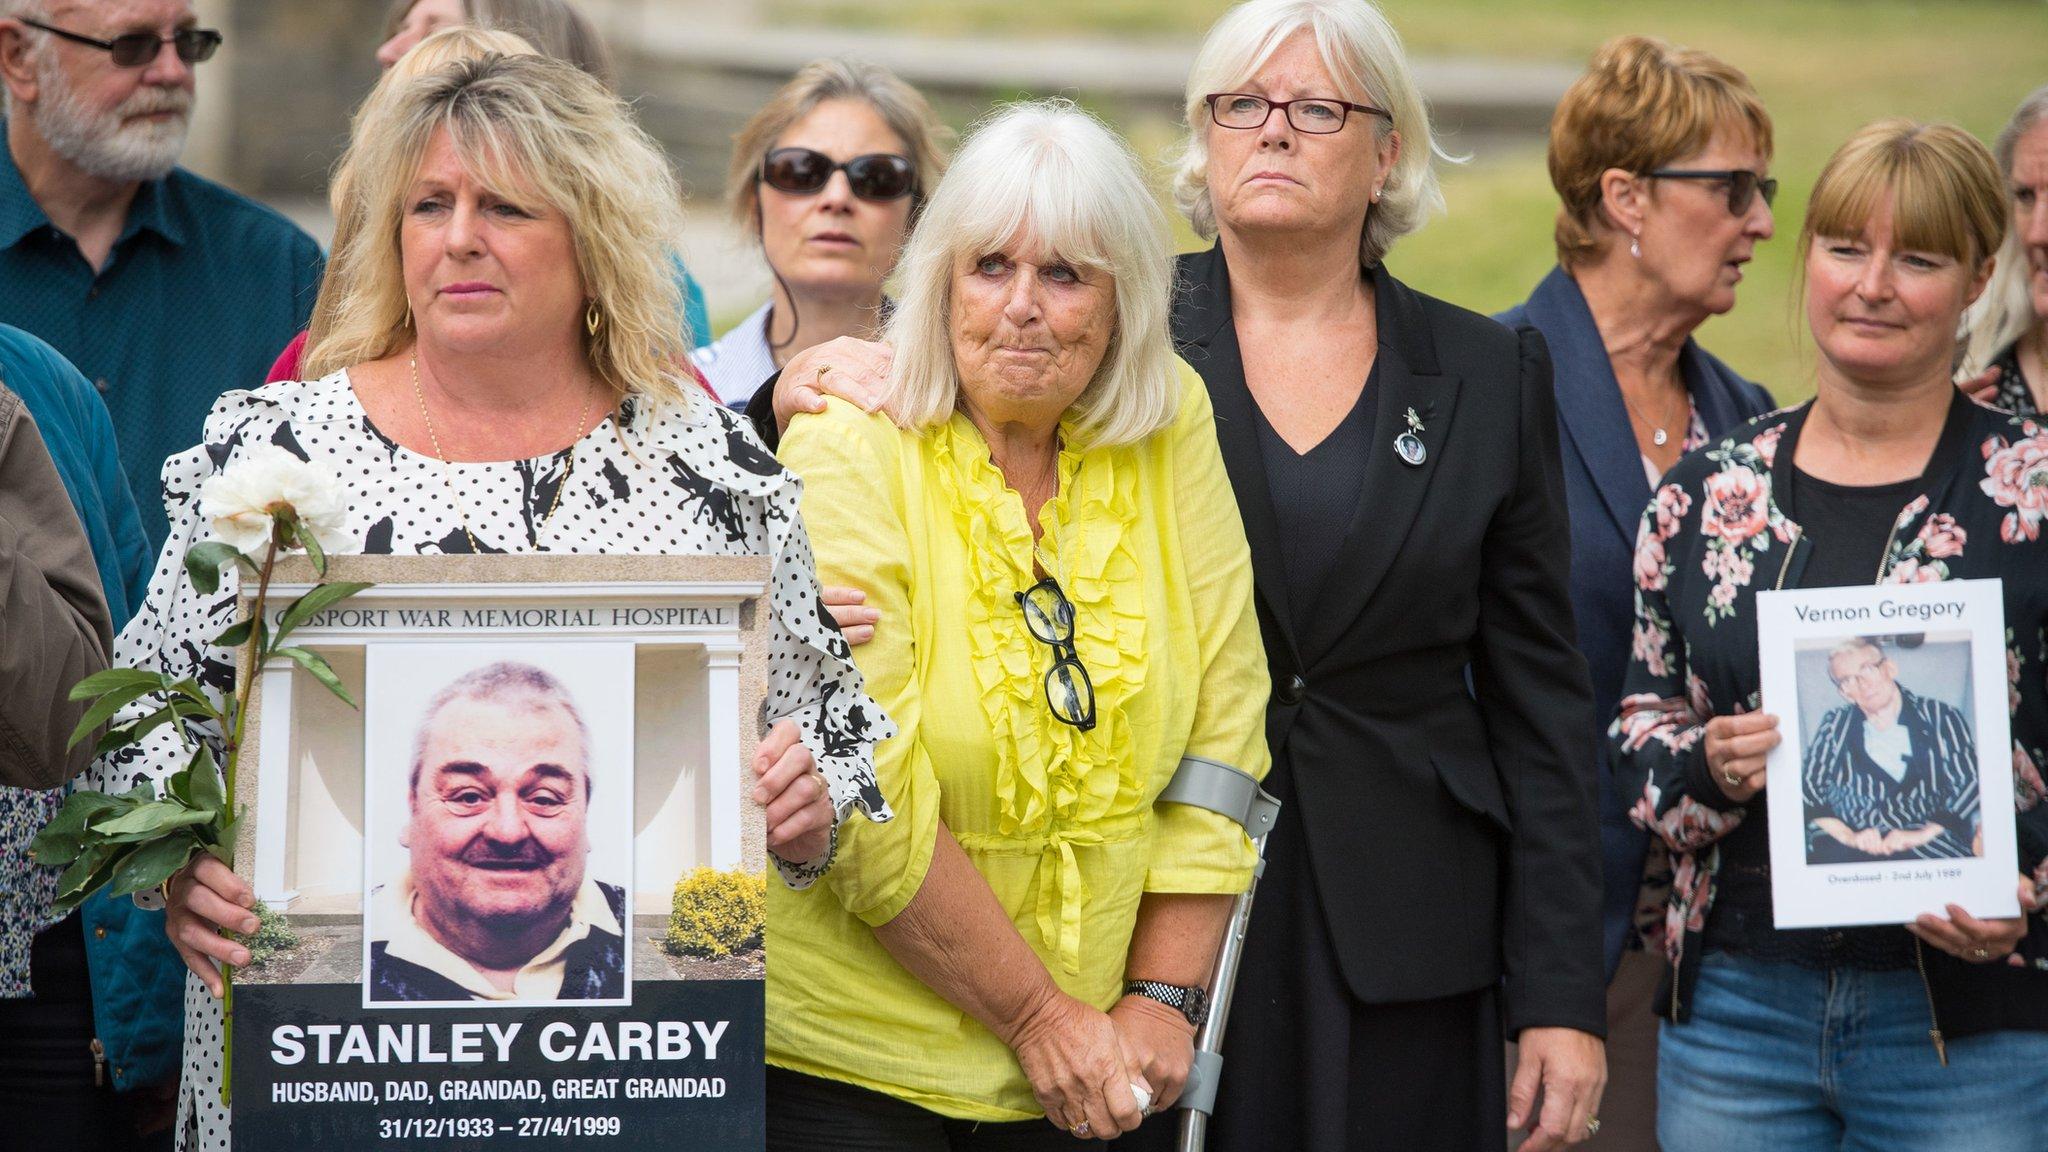 Gosport hospital deaths: Drugs scandal 'may be happening elsewhere'